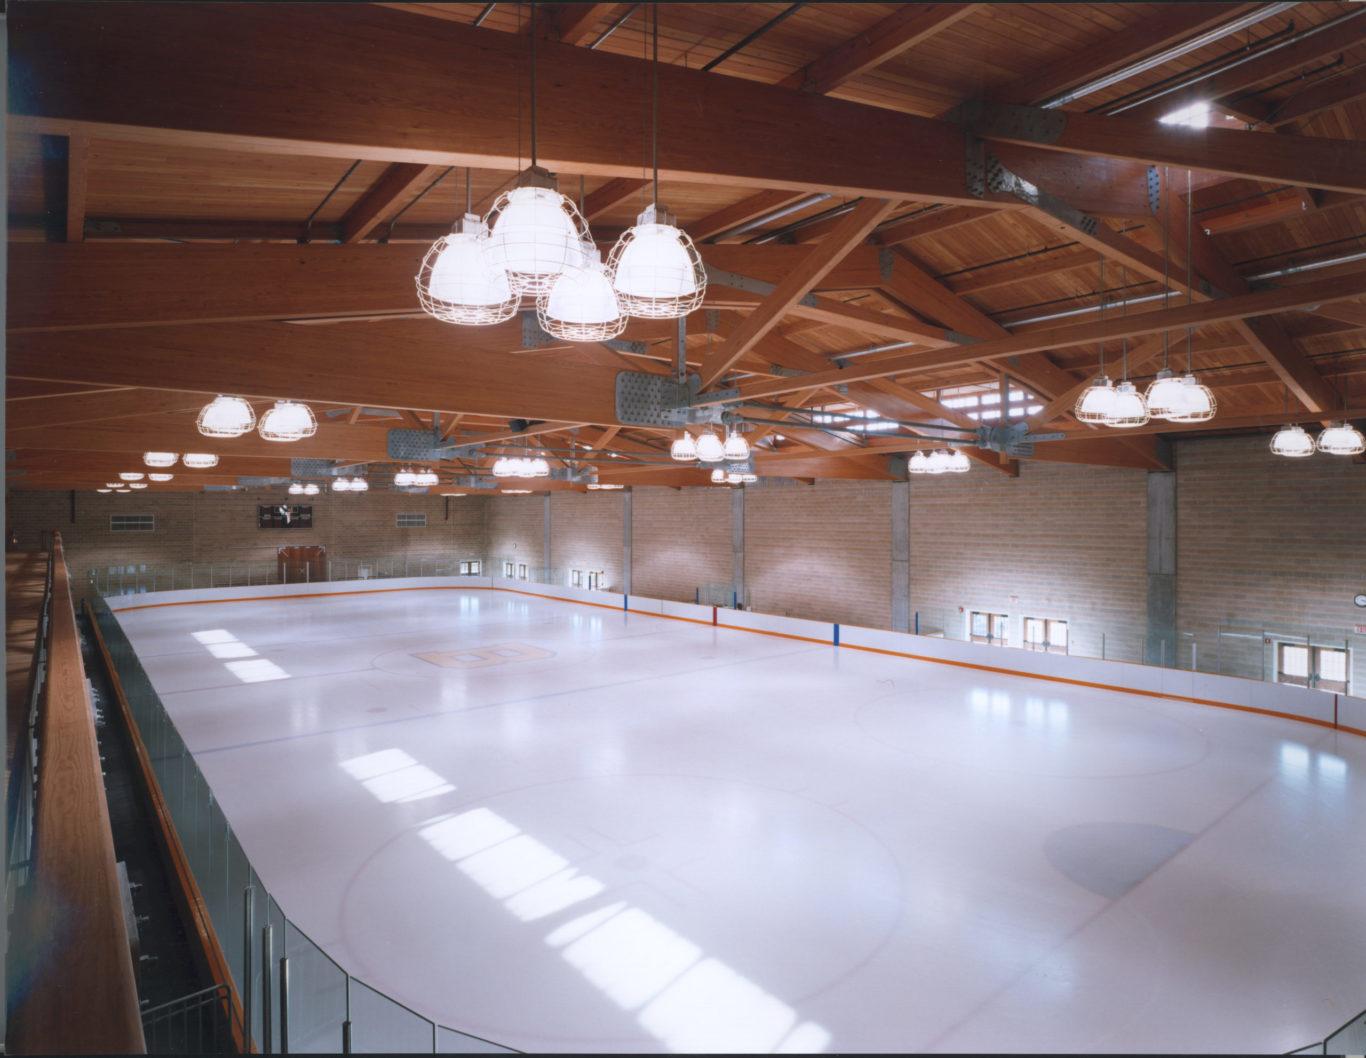 Slide 3 of 7, Brunswick School – Athletic Center